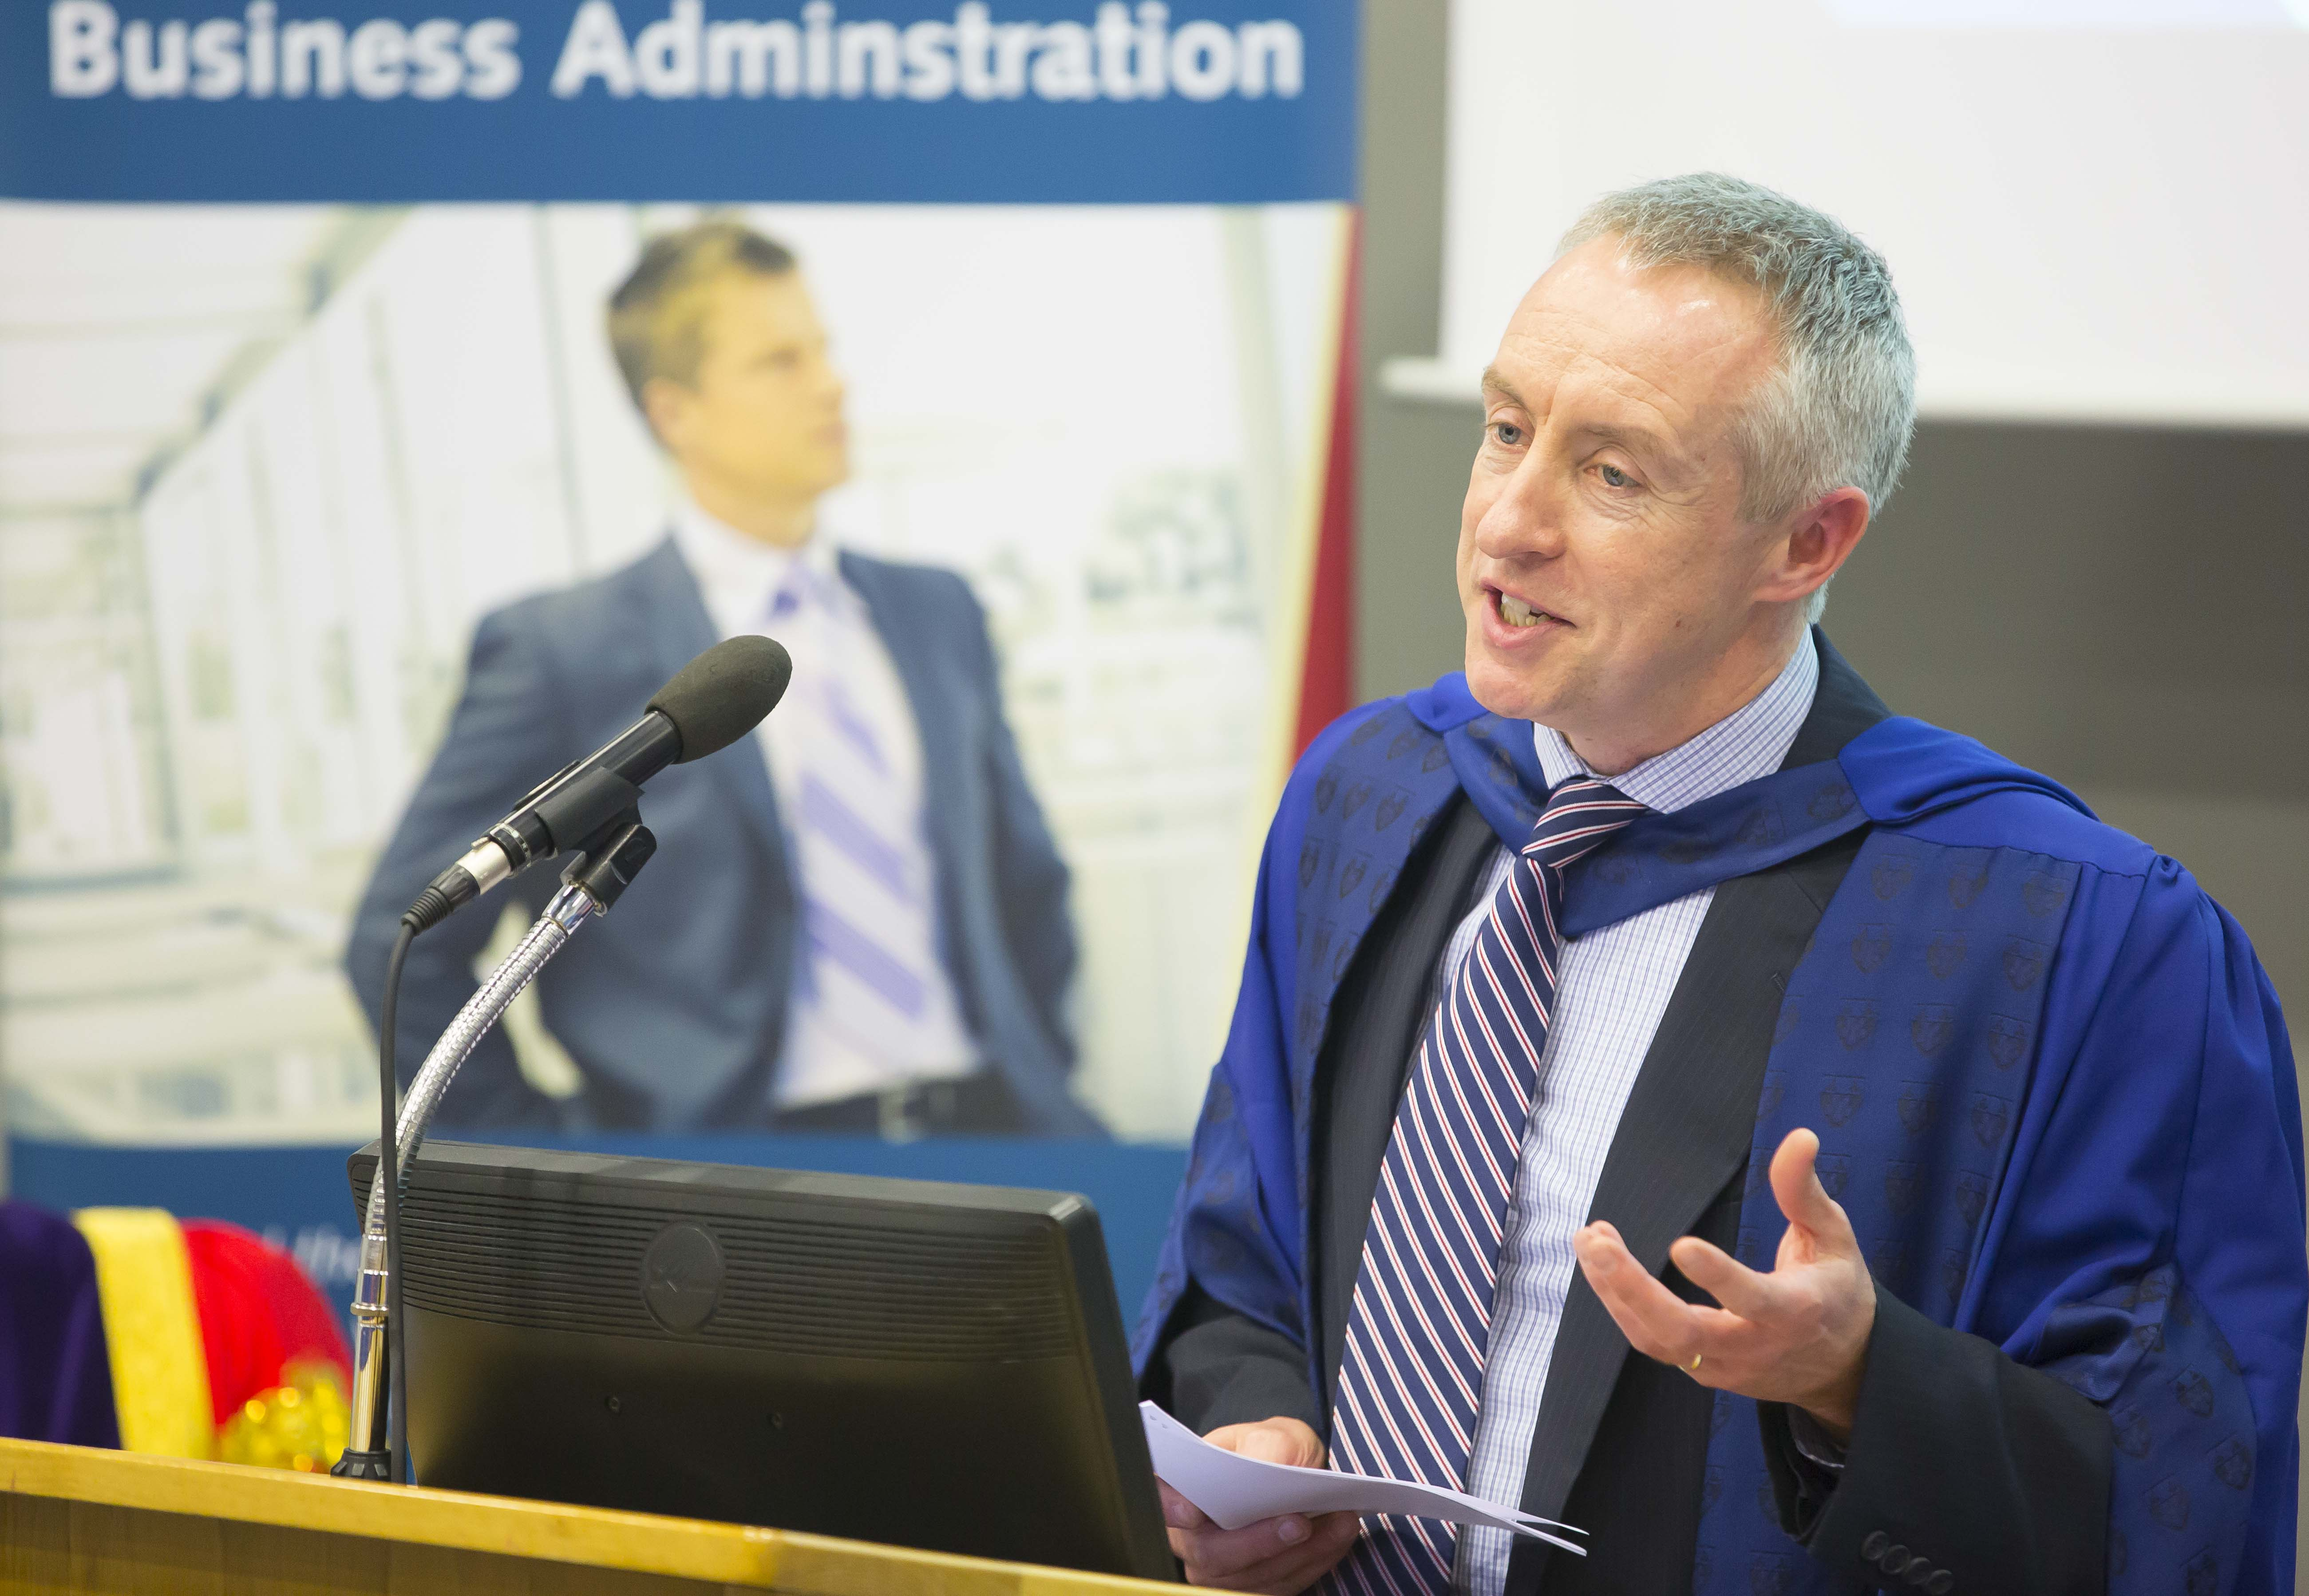 Prof Harrington, Head of Postgraduate Business, speaking at the inaugural Professorial Public Lecture Series